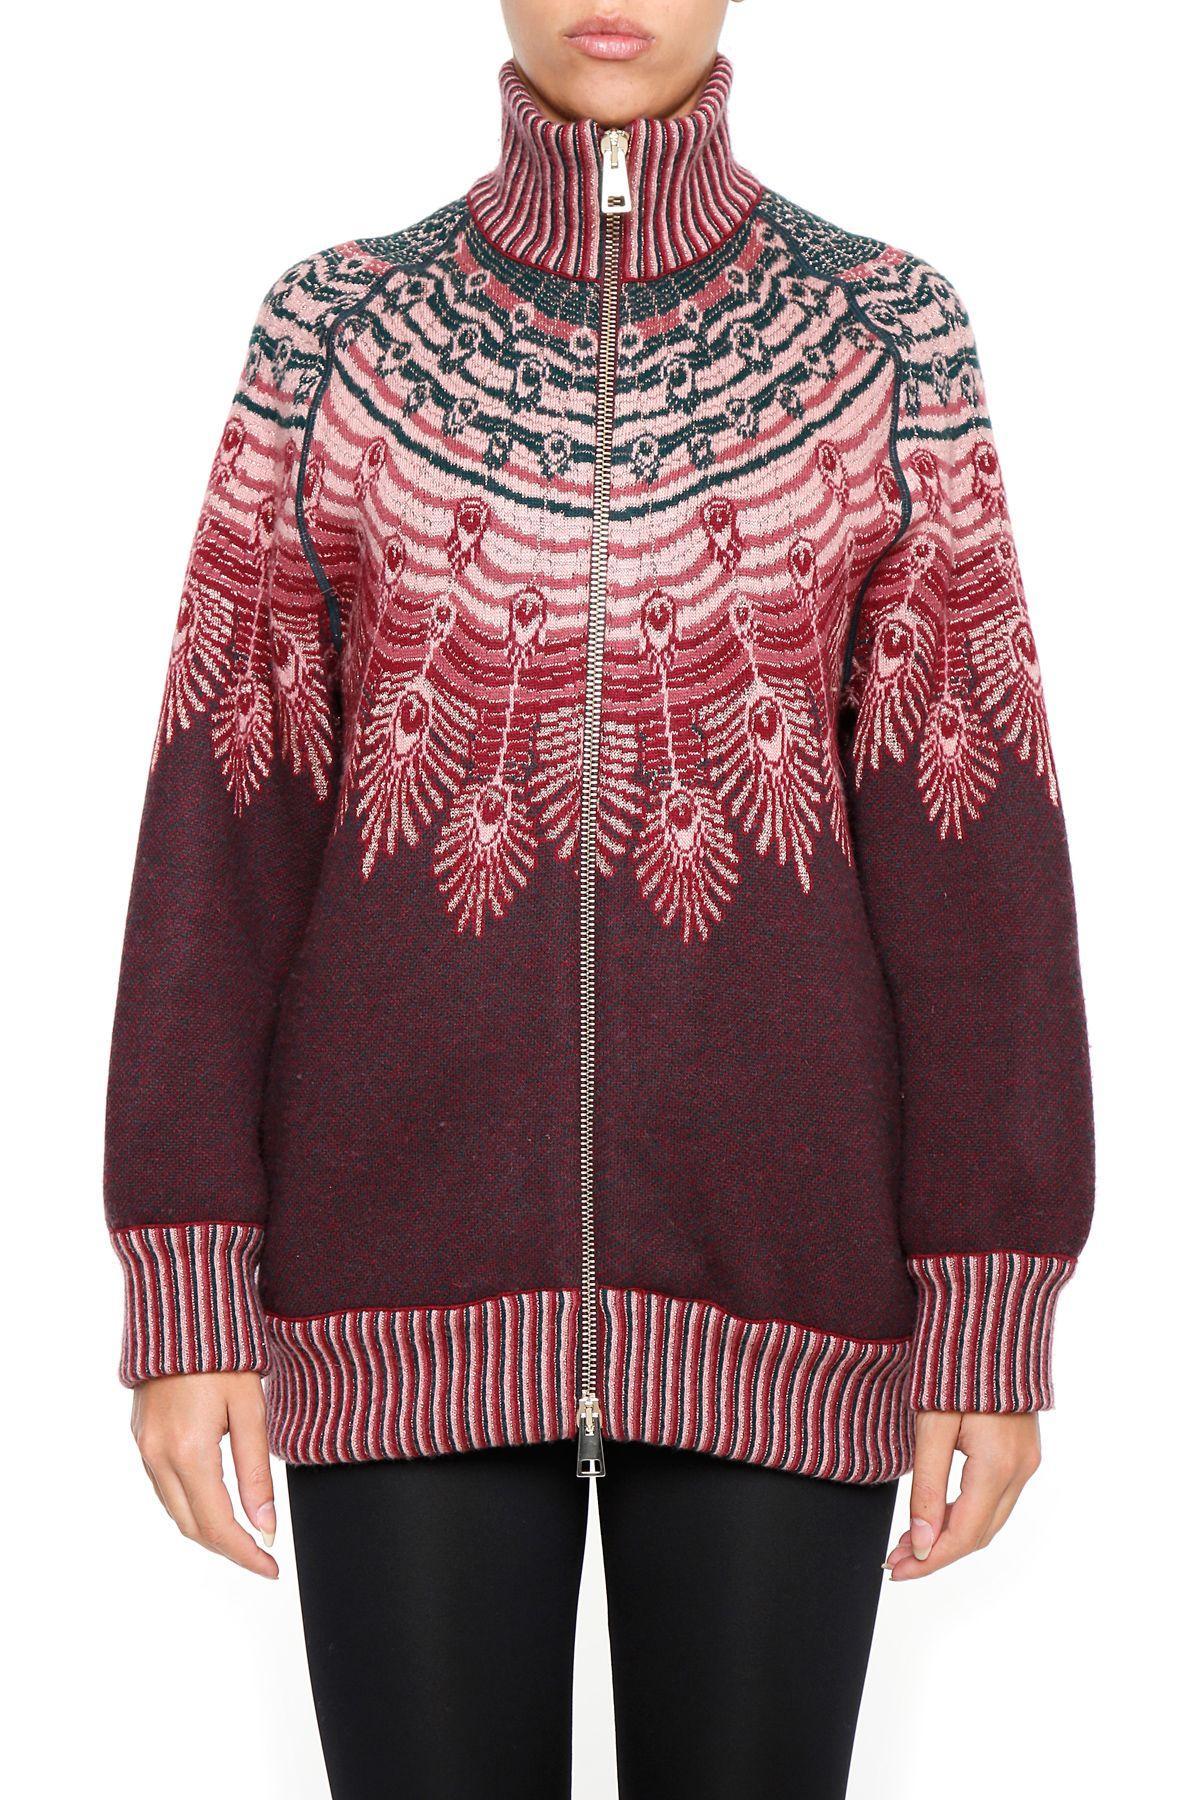 Giada Benincasa Wool And Lurex Bomber Jacket In Catch Dreamer Blush rosa